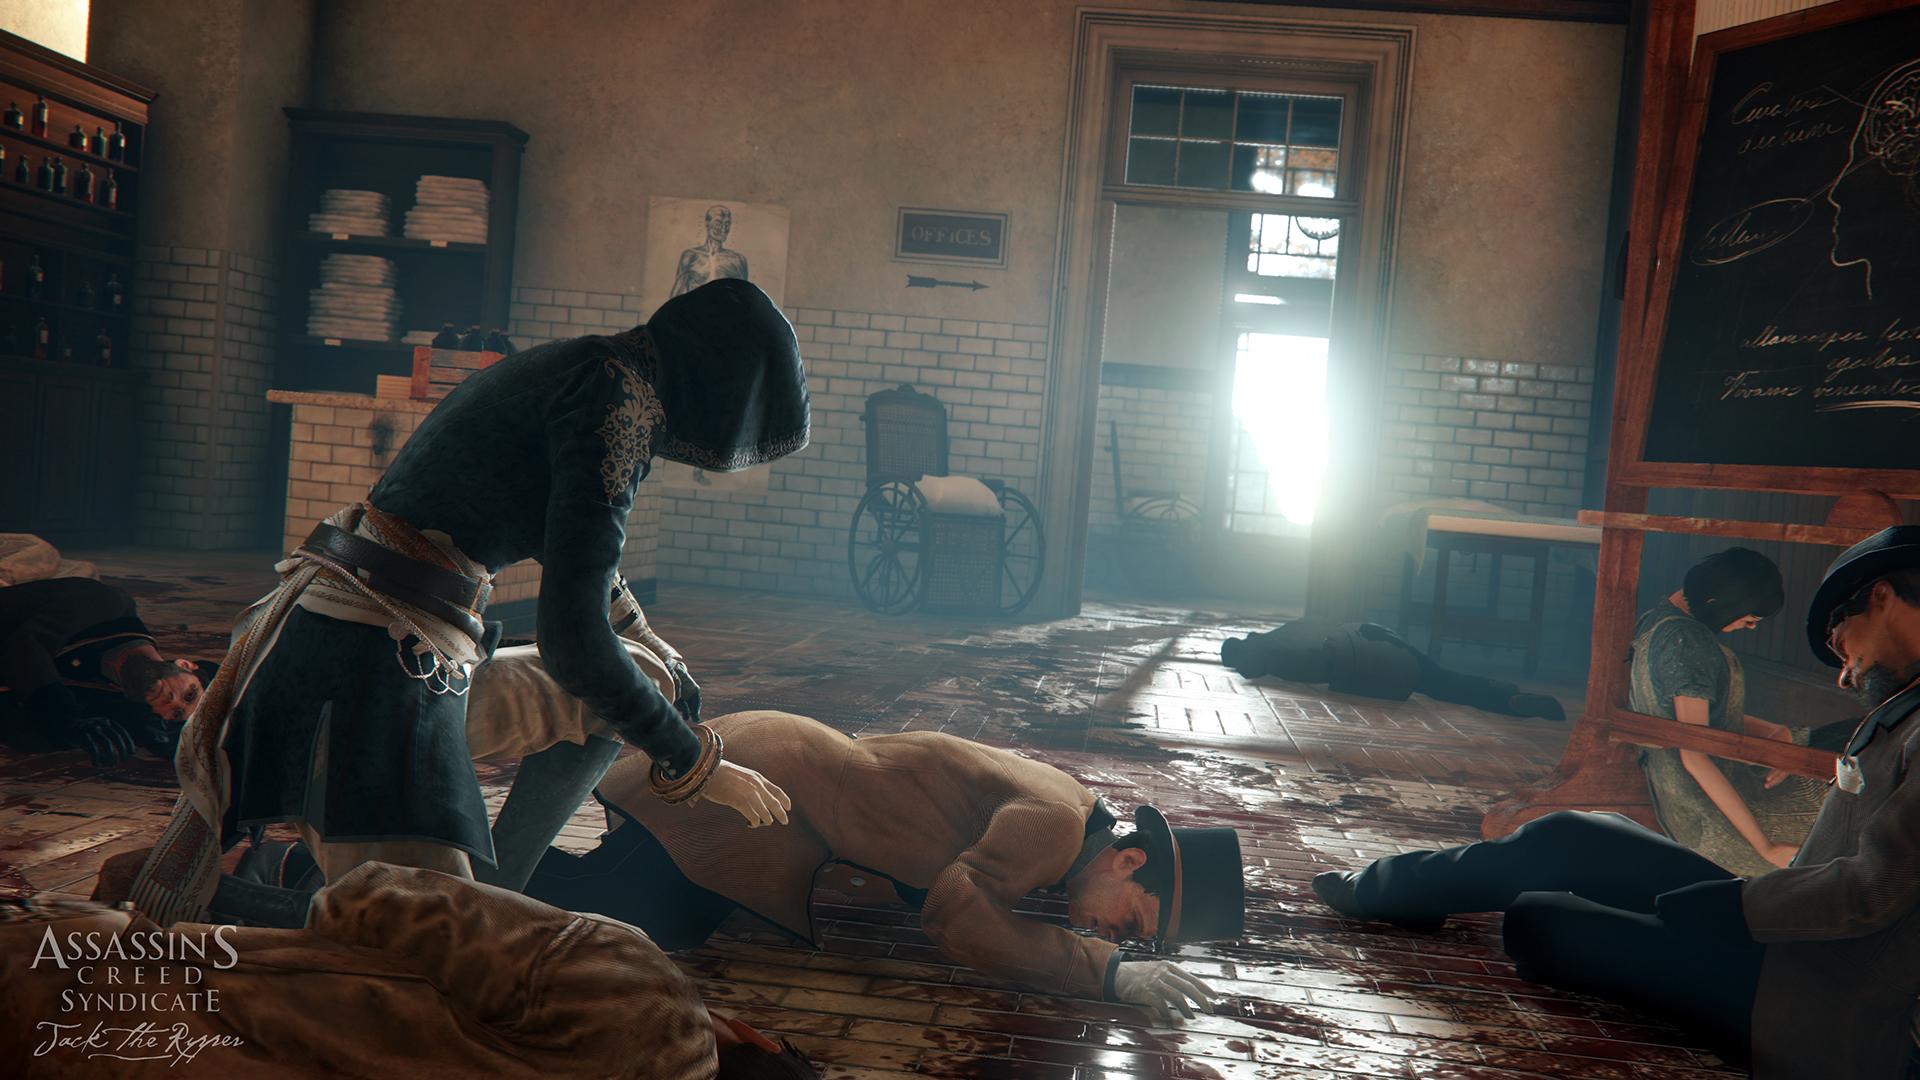 Assassin s Creed Origins (Video Game ) - IMDb